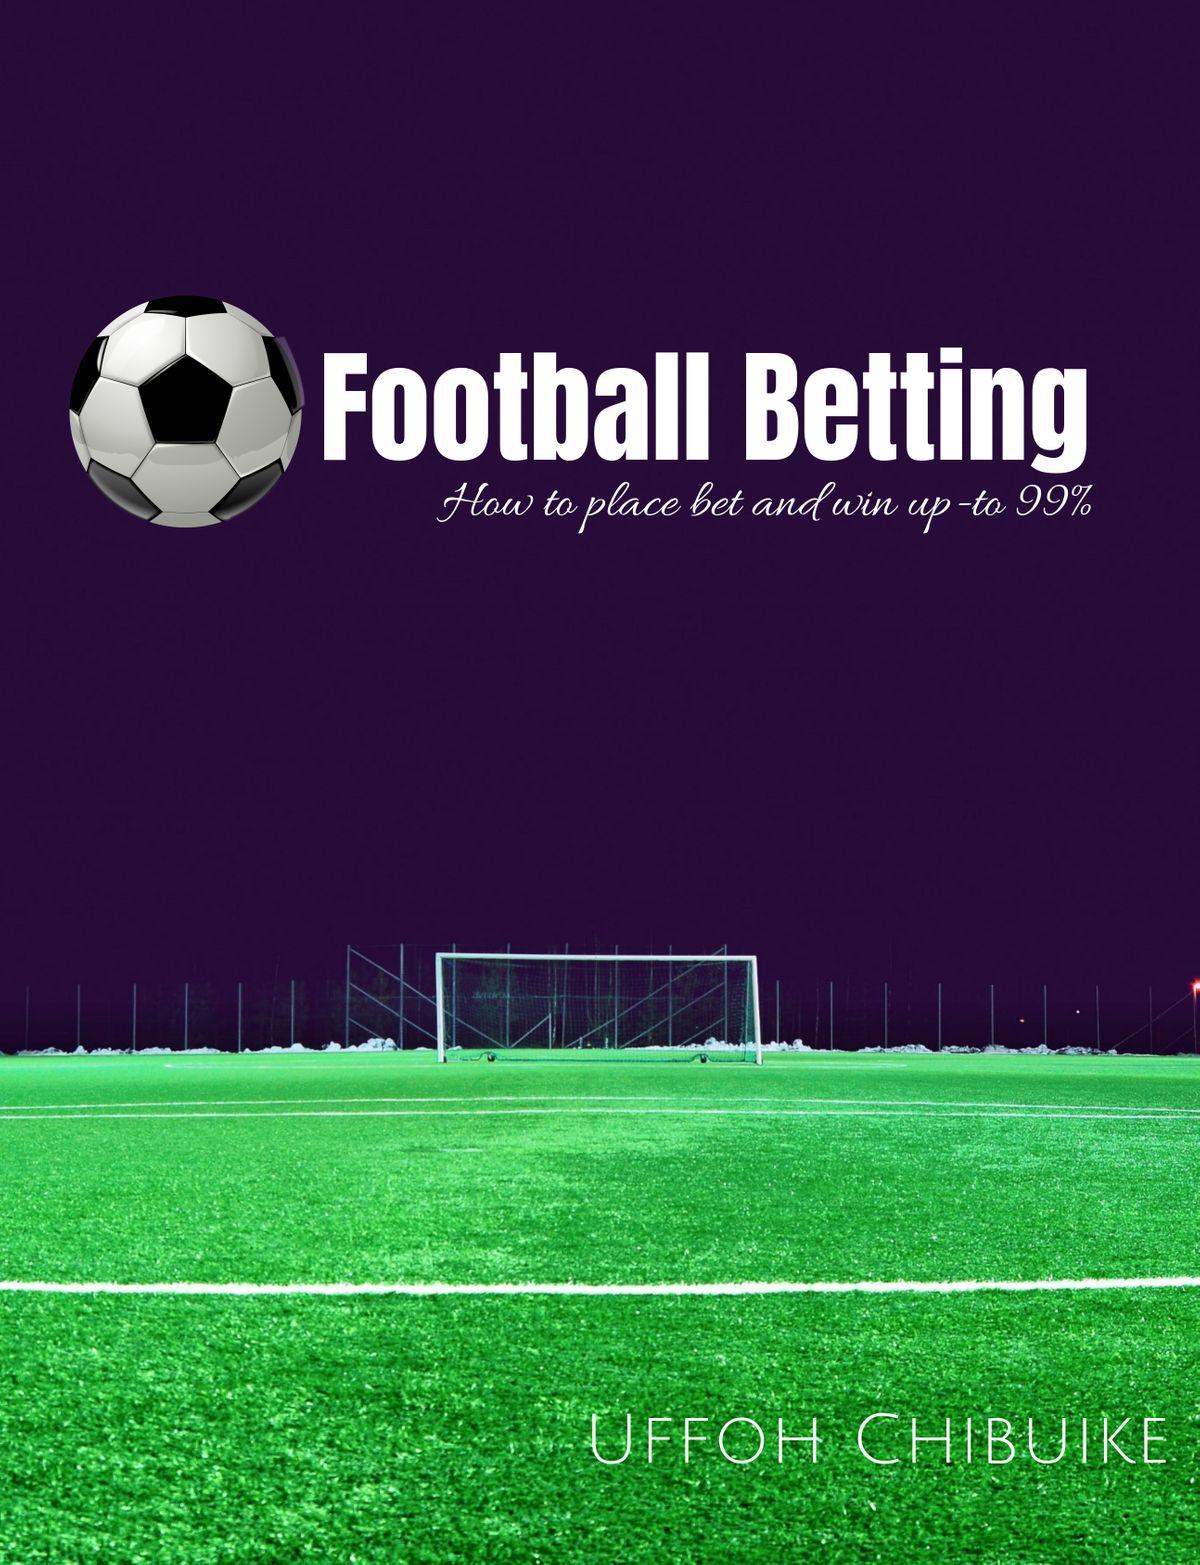 Sports betting ebooks dota 2 betting lounge furniture